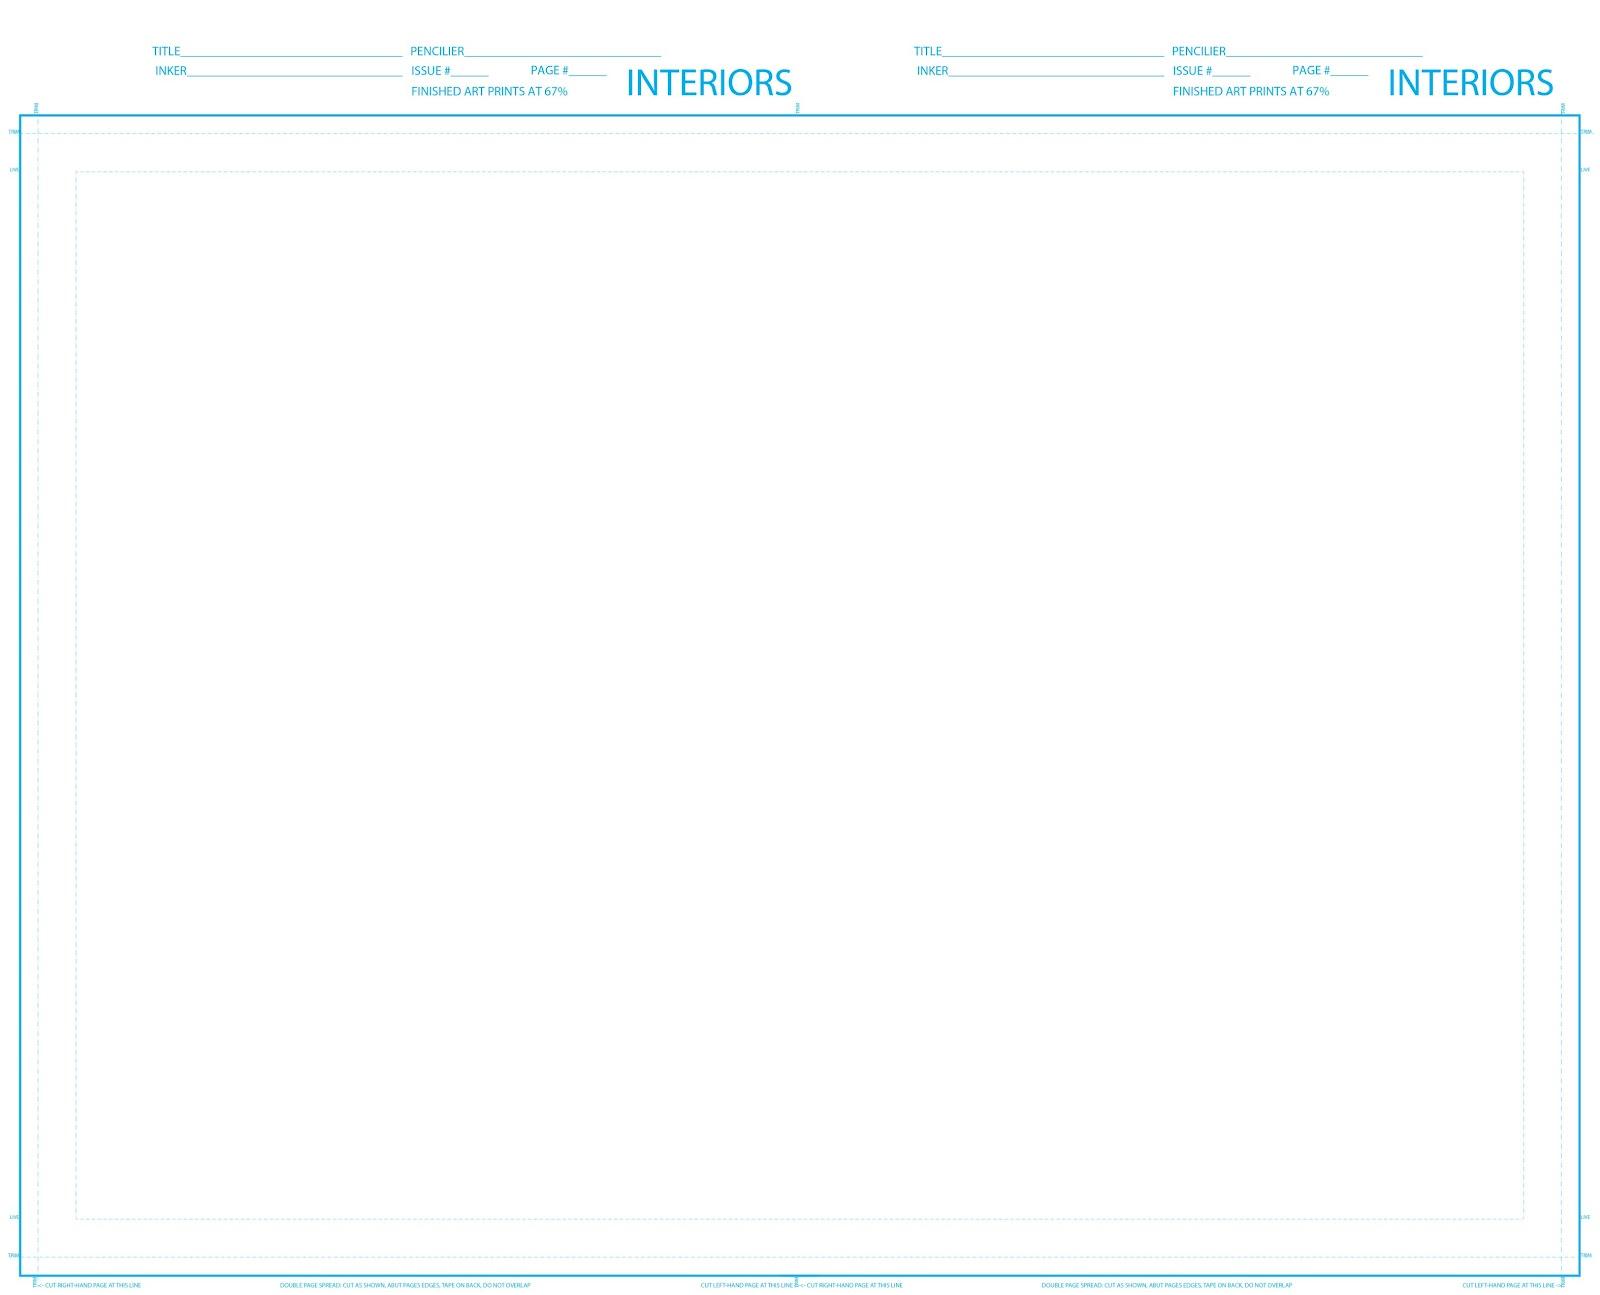 Jcat studio tools resources double page spread maxwellsz